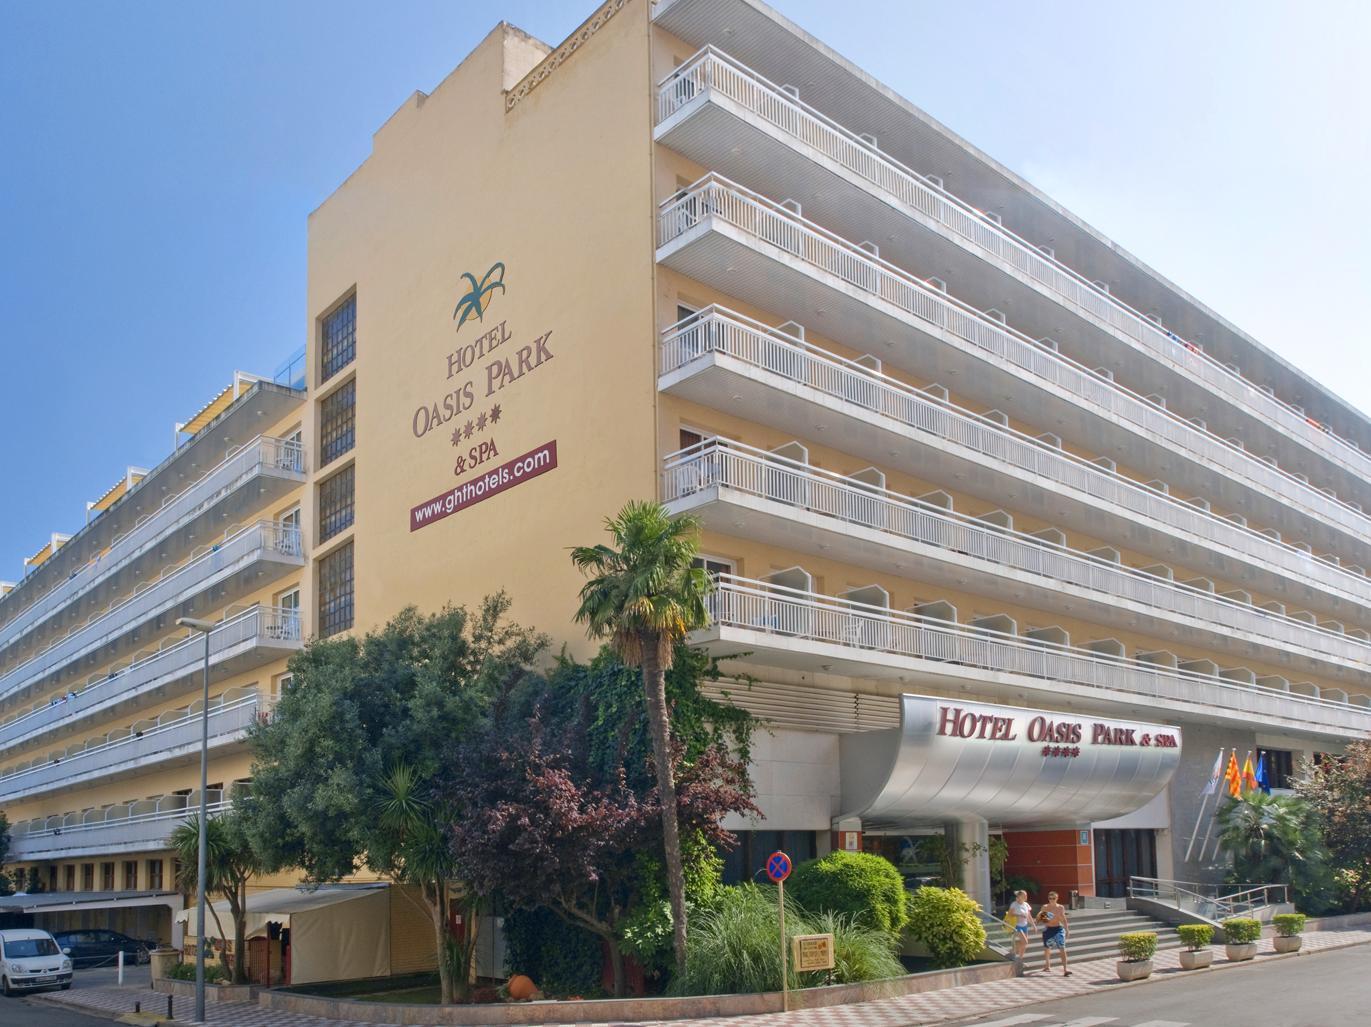 hotel oasis park lloret de mar beach lloret de mar spain great discounted rates. Black Bedroom Furniture Sets. Home Design Ideas